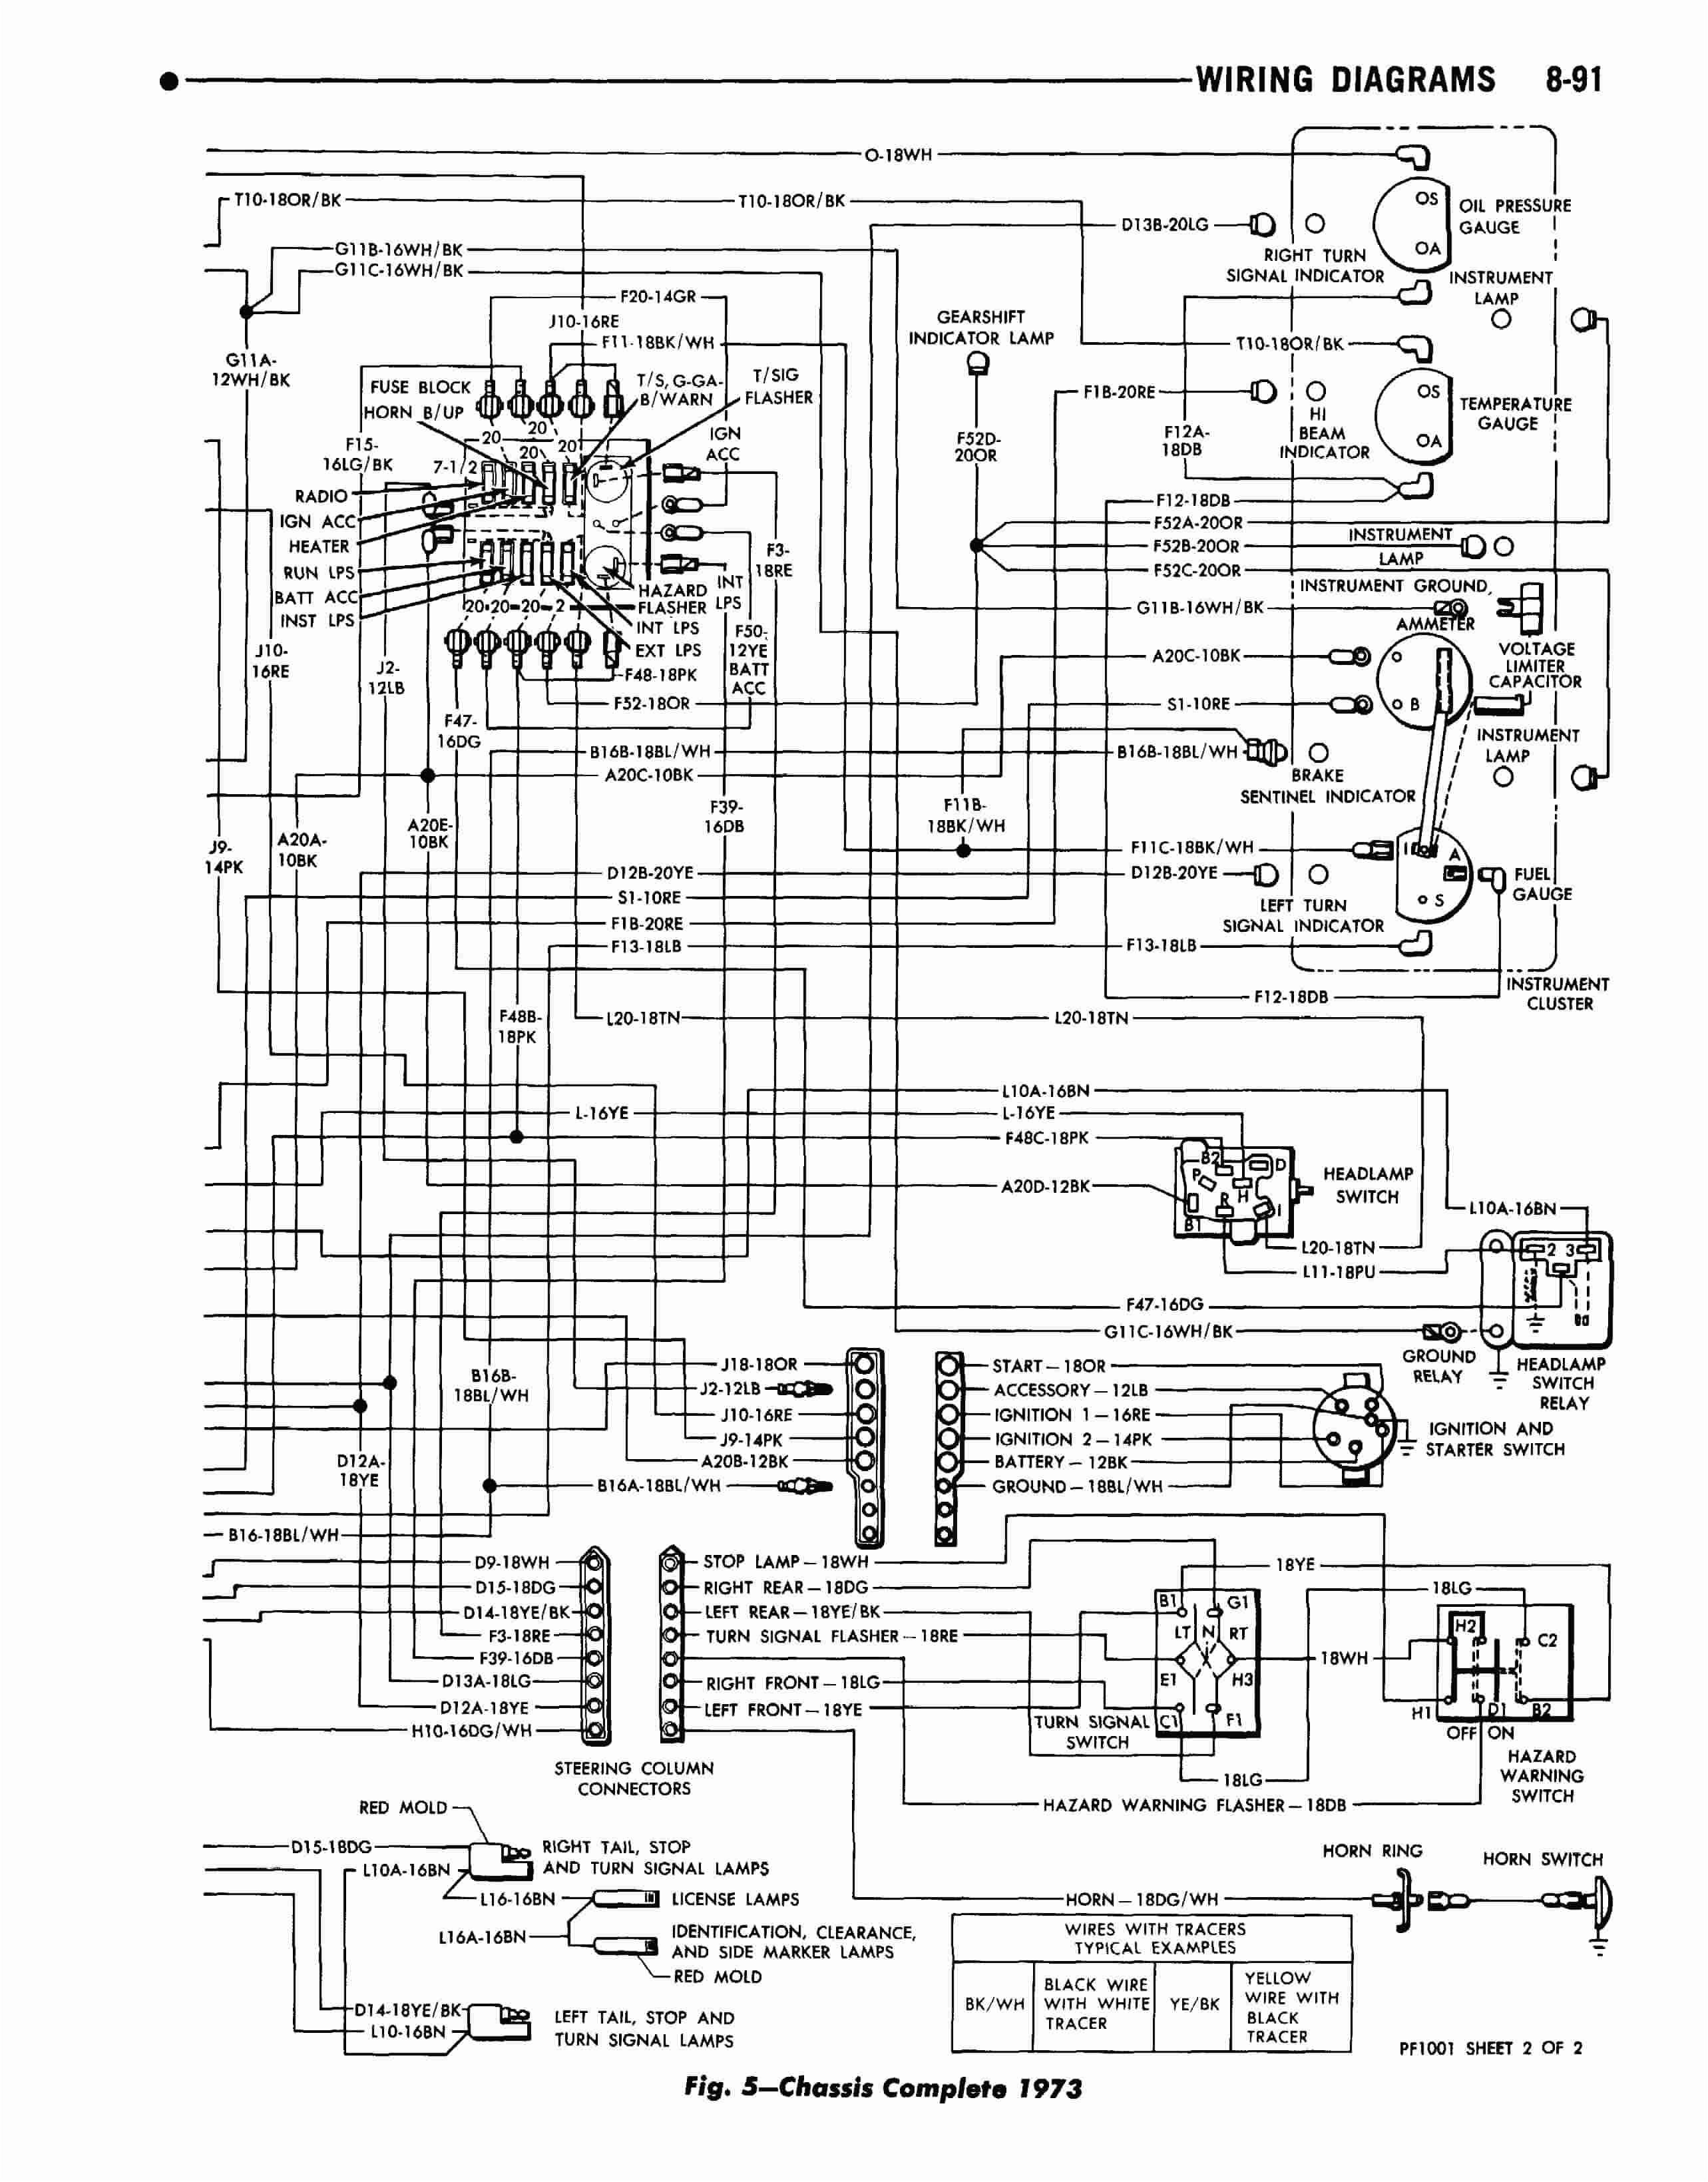 rv electrical wiring diagram schema diagram database rv power wiring diagram motorhome electrical diagram wiring diagram